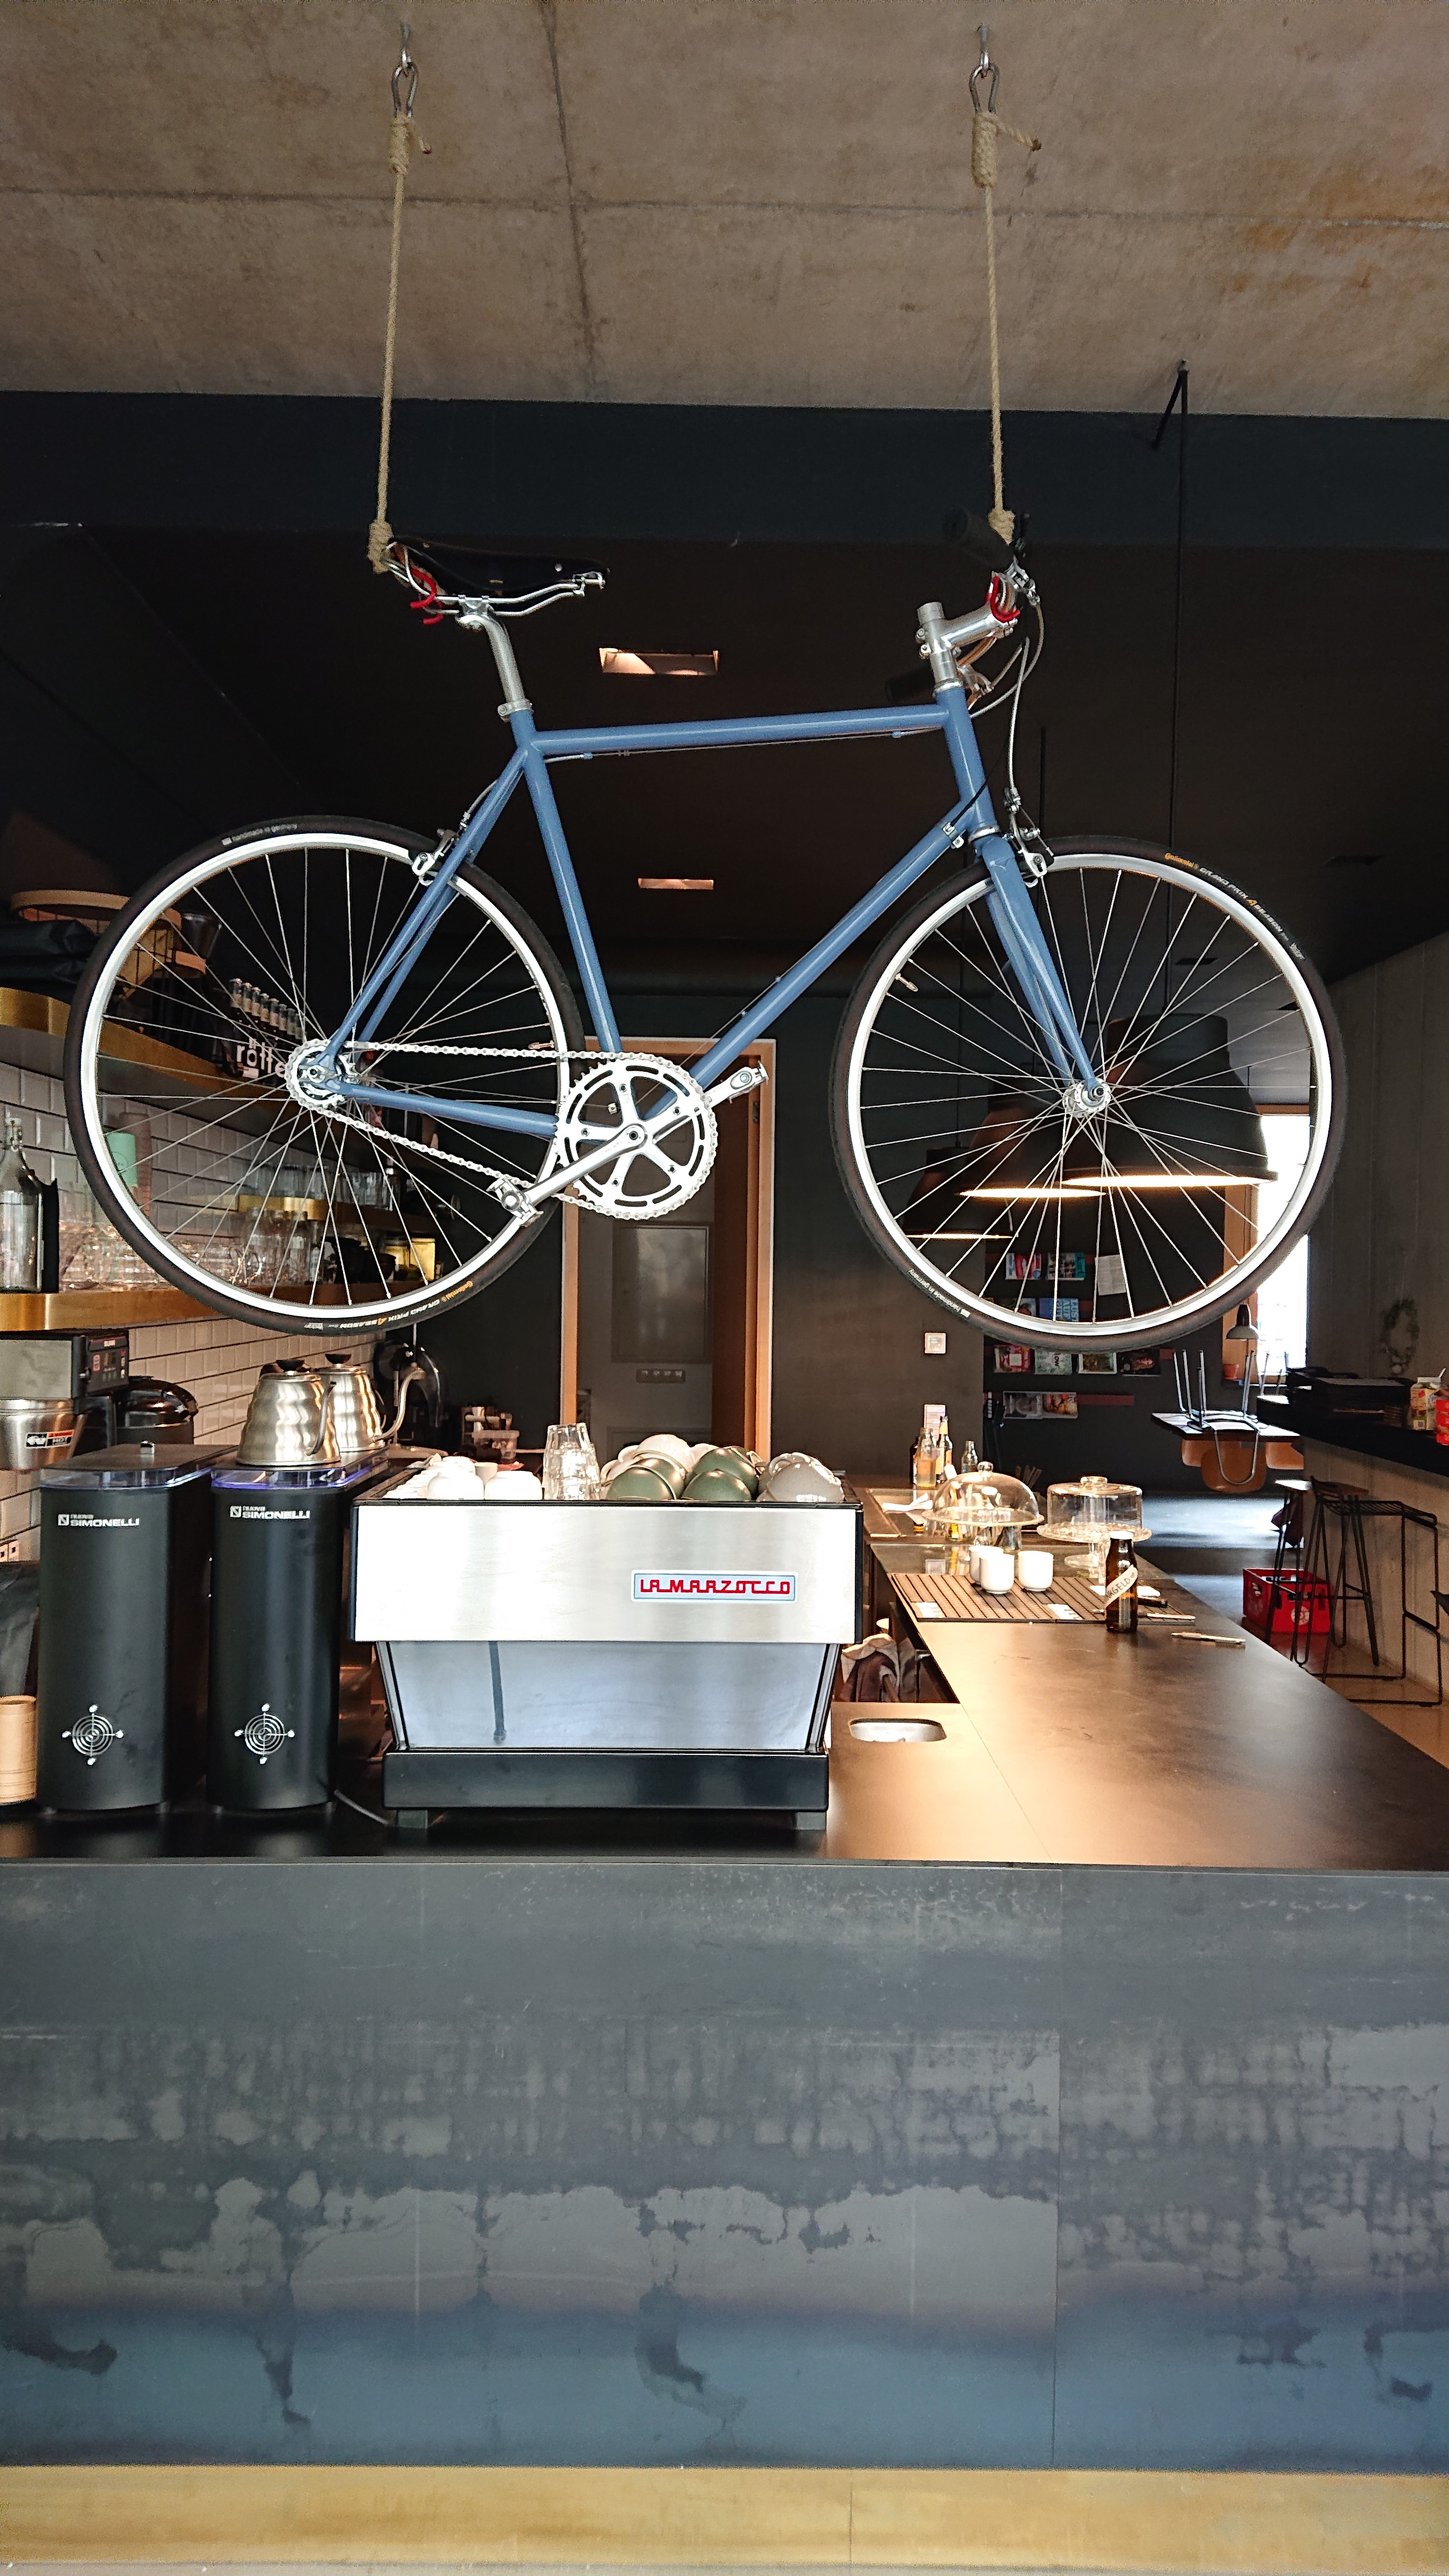 Basement Bikes goes Rötterdam